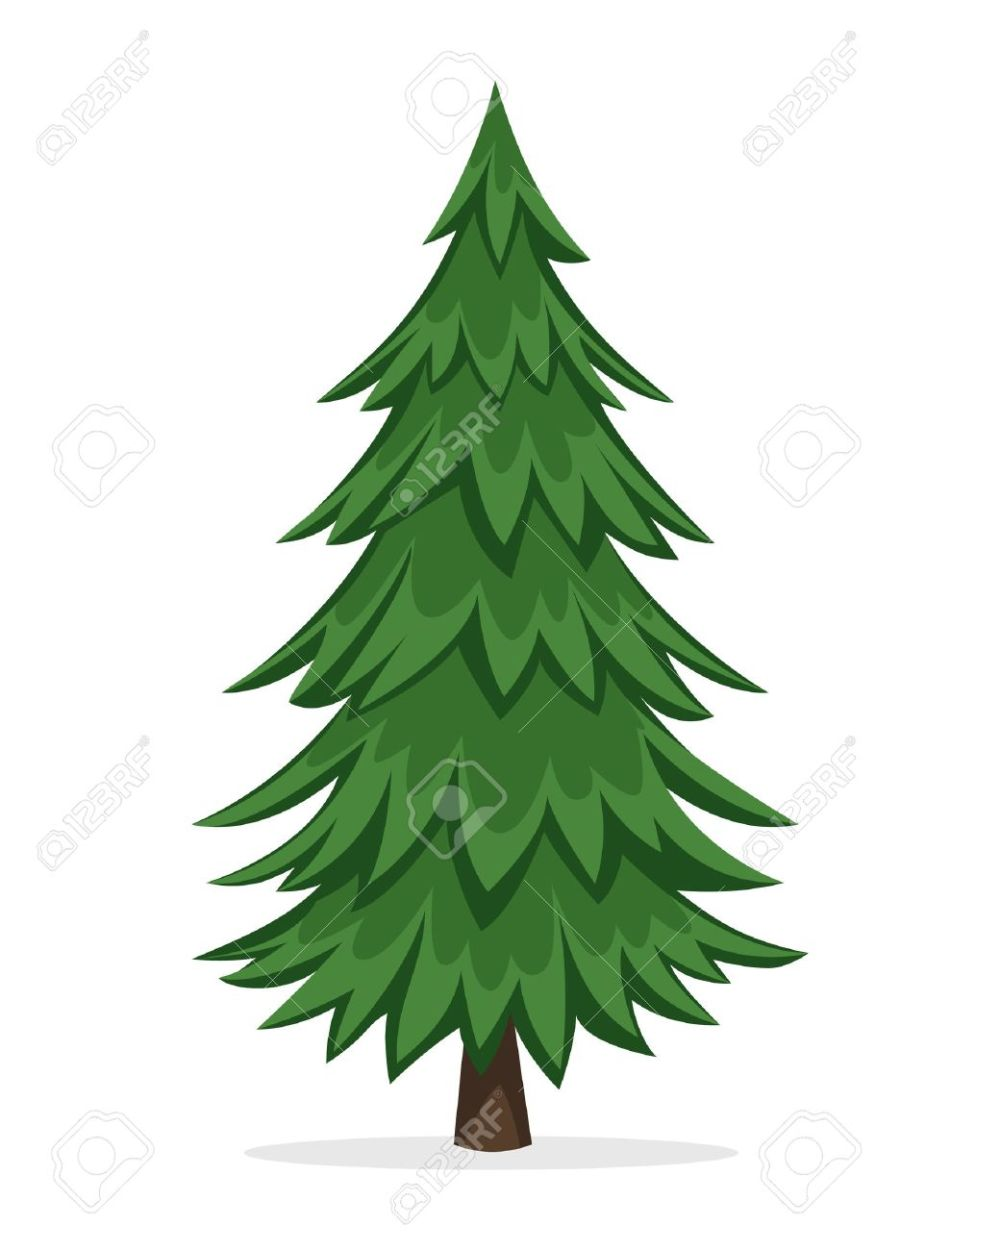 medium resolution of 1040x1300 cartoon pine trees free download clip art